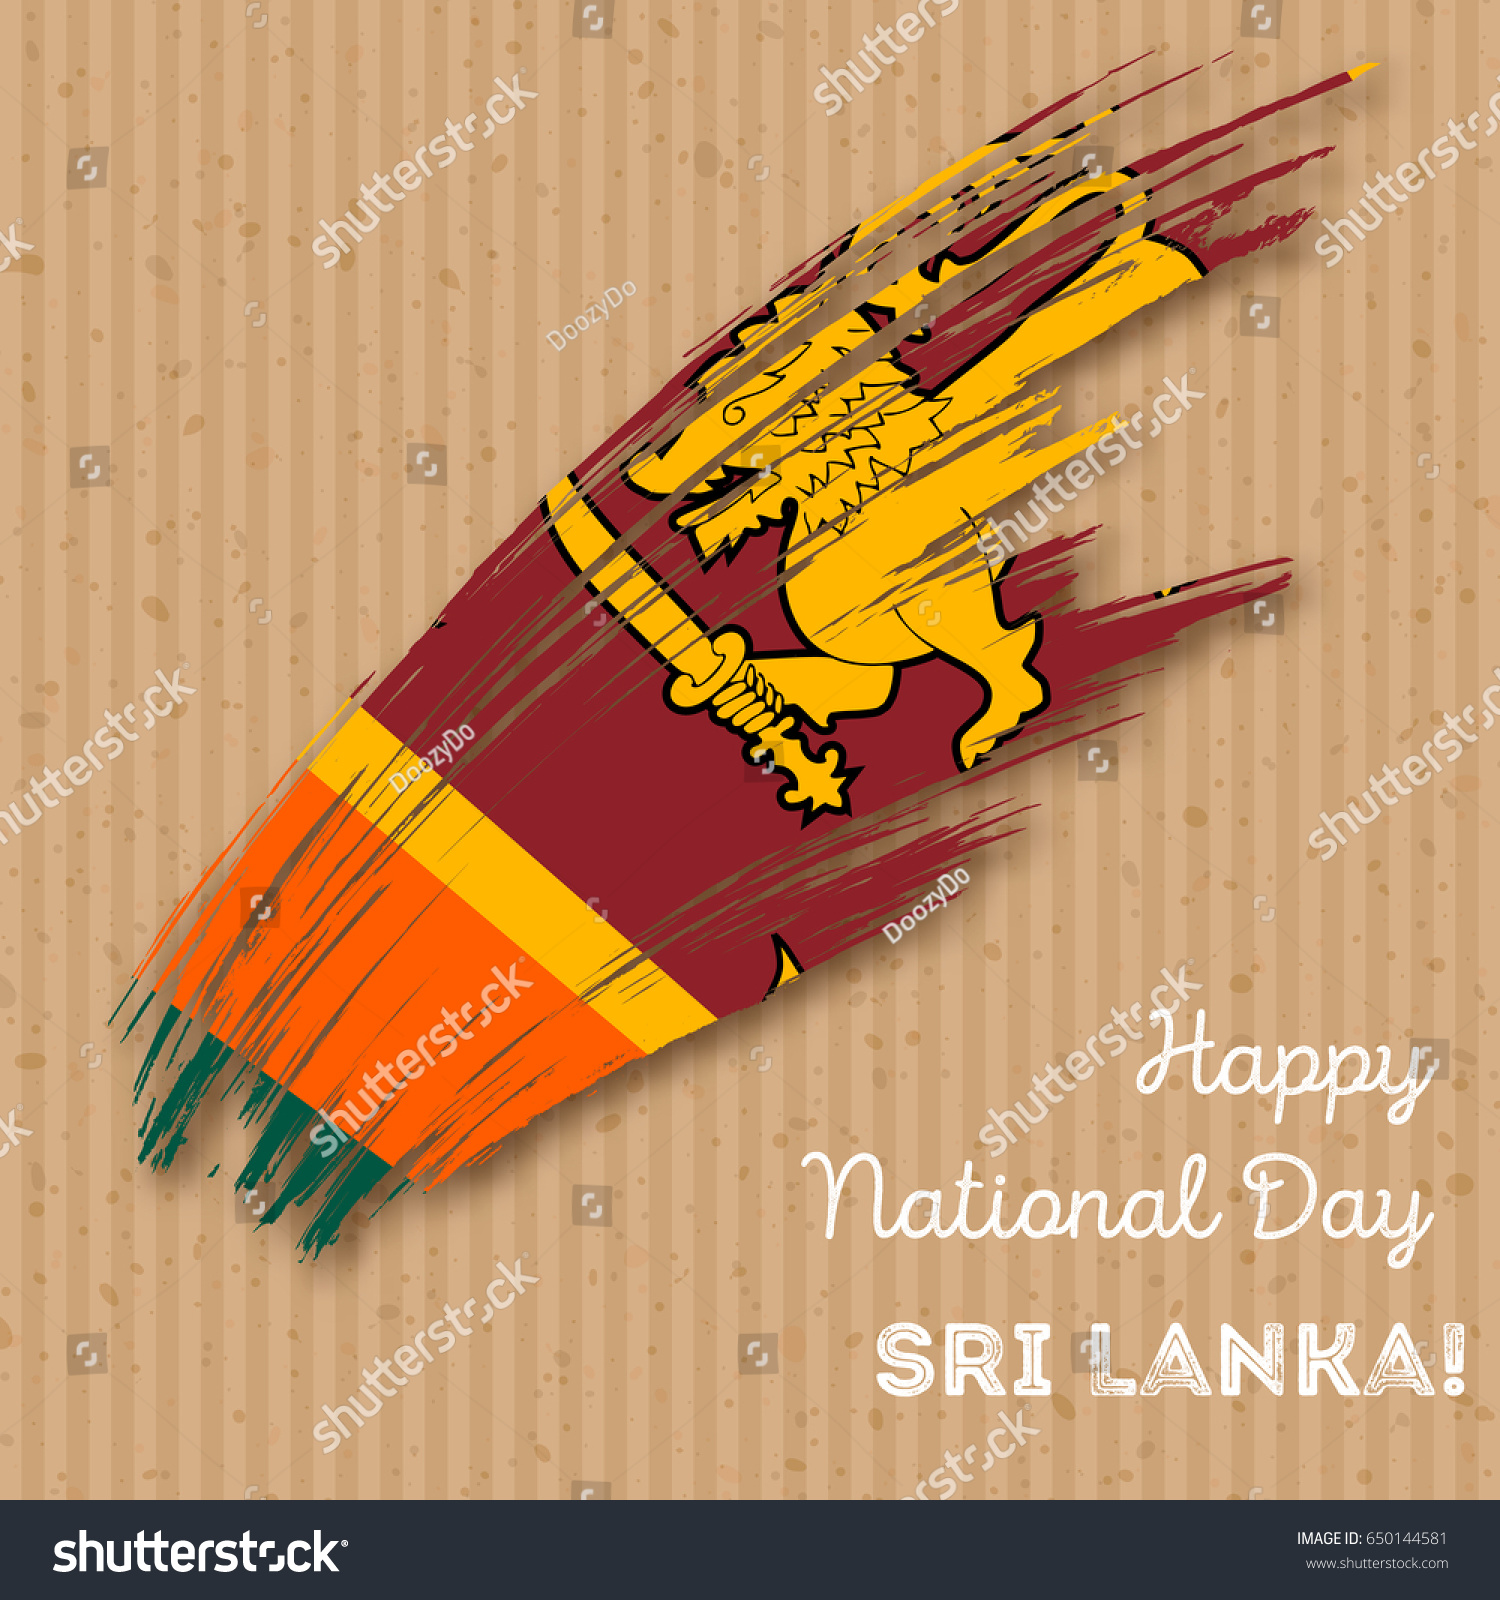 Sri Lanka Independence Day Patriotic Design Stock Vector Royalty